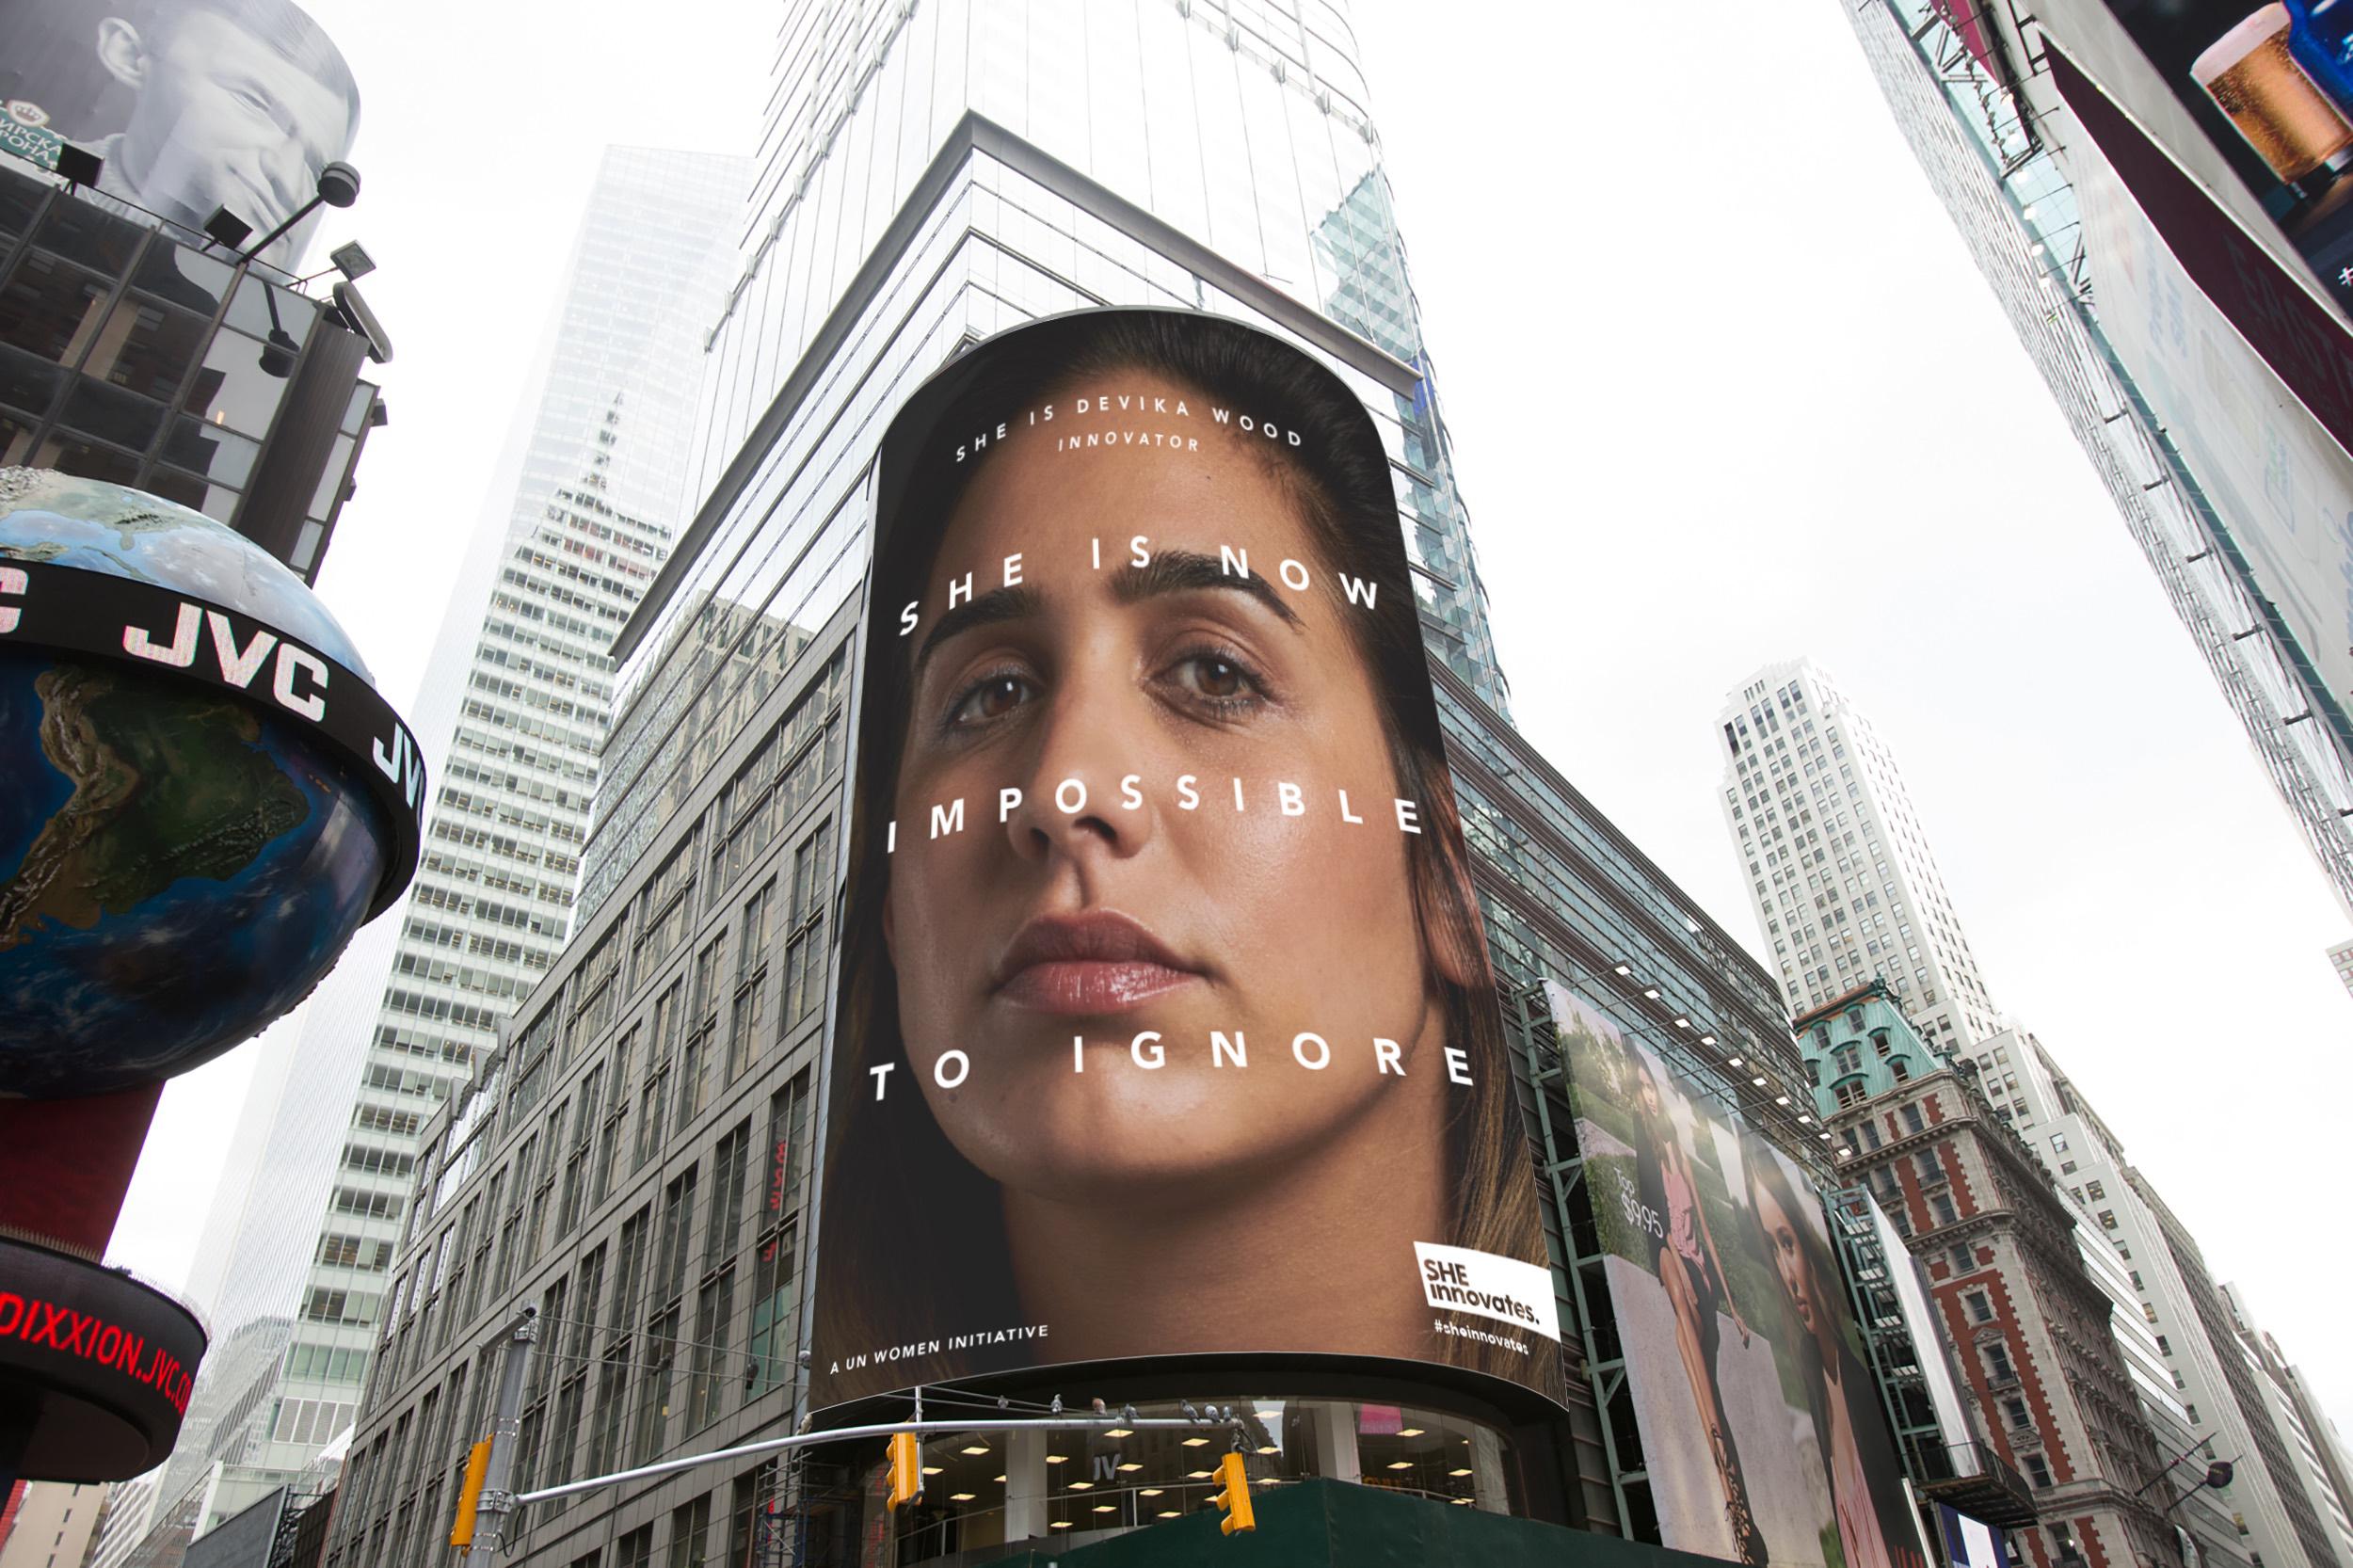 UN Women: Impossible to Ignore